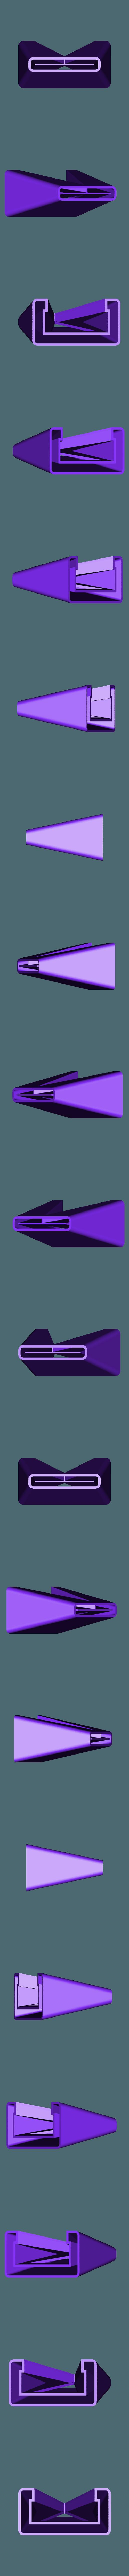 5cmBiasTape_Q2.stl Download free STL file 3cm / 3.5cm / 4cm / 5cm Simple Bias Tape Maker, zakladac pasku • 3D printable template, ongaroo